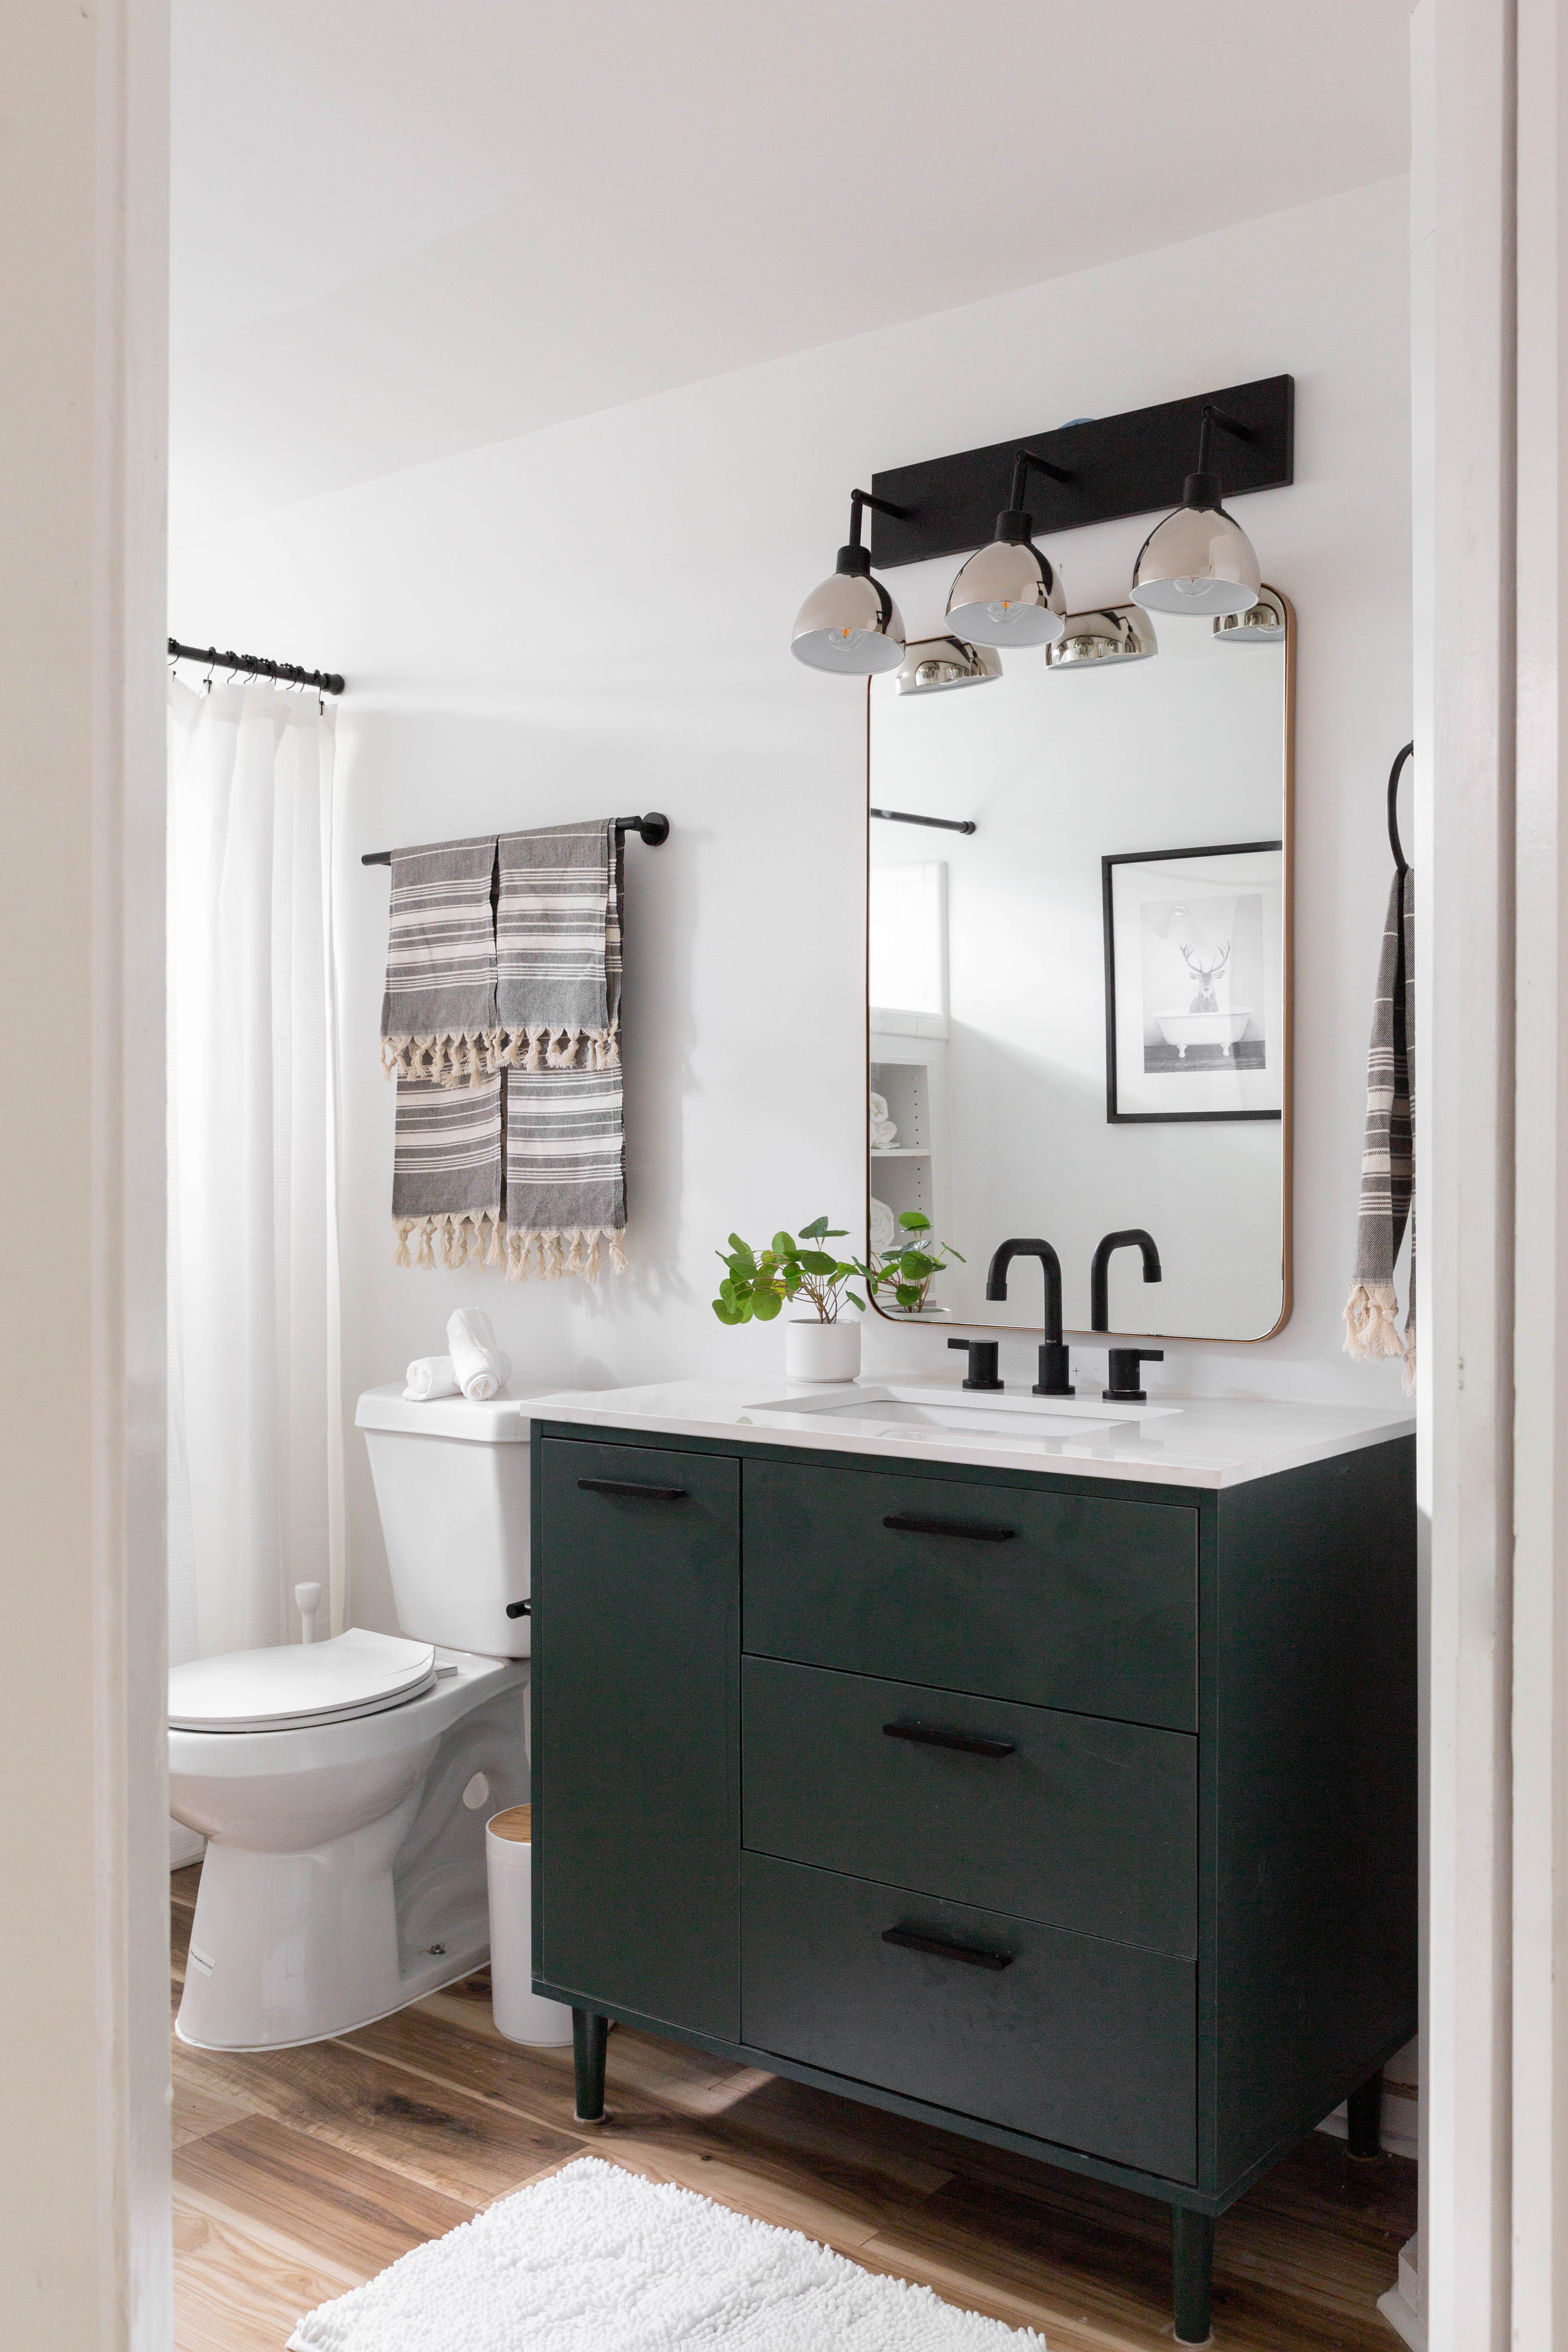 14 bathroom 20210627-IMG_7548.jpg